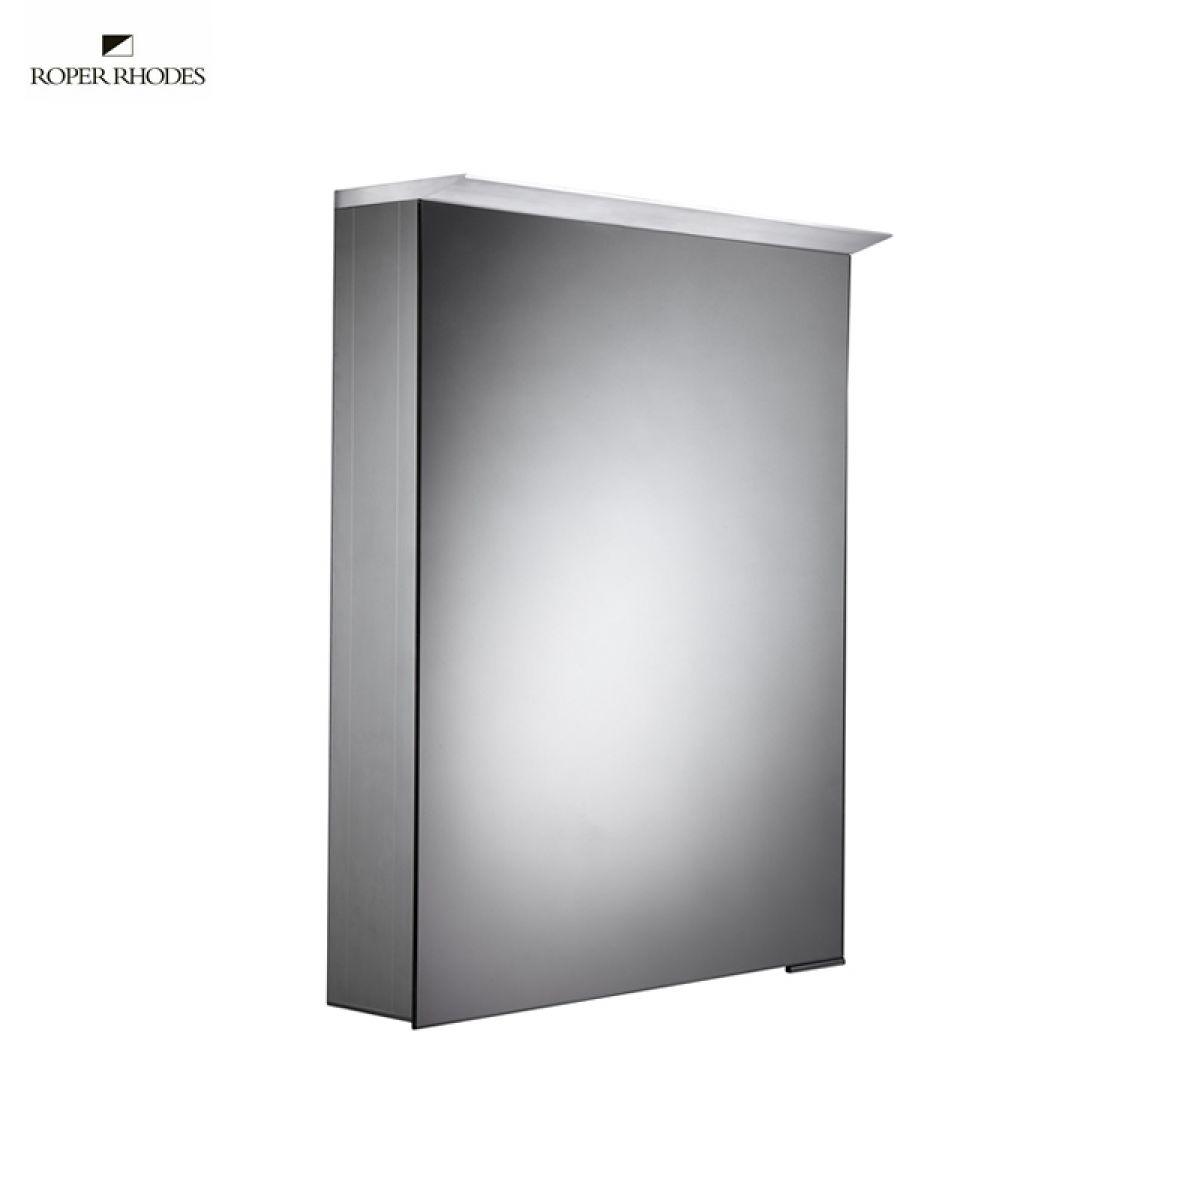 roper rhodes vantage illuminated bathroom cabinet uk bathrooms